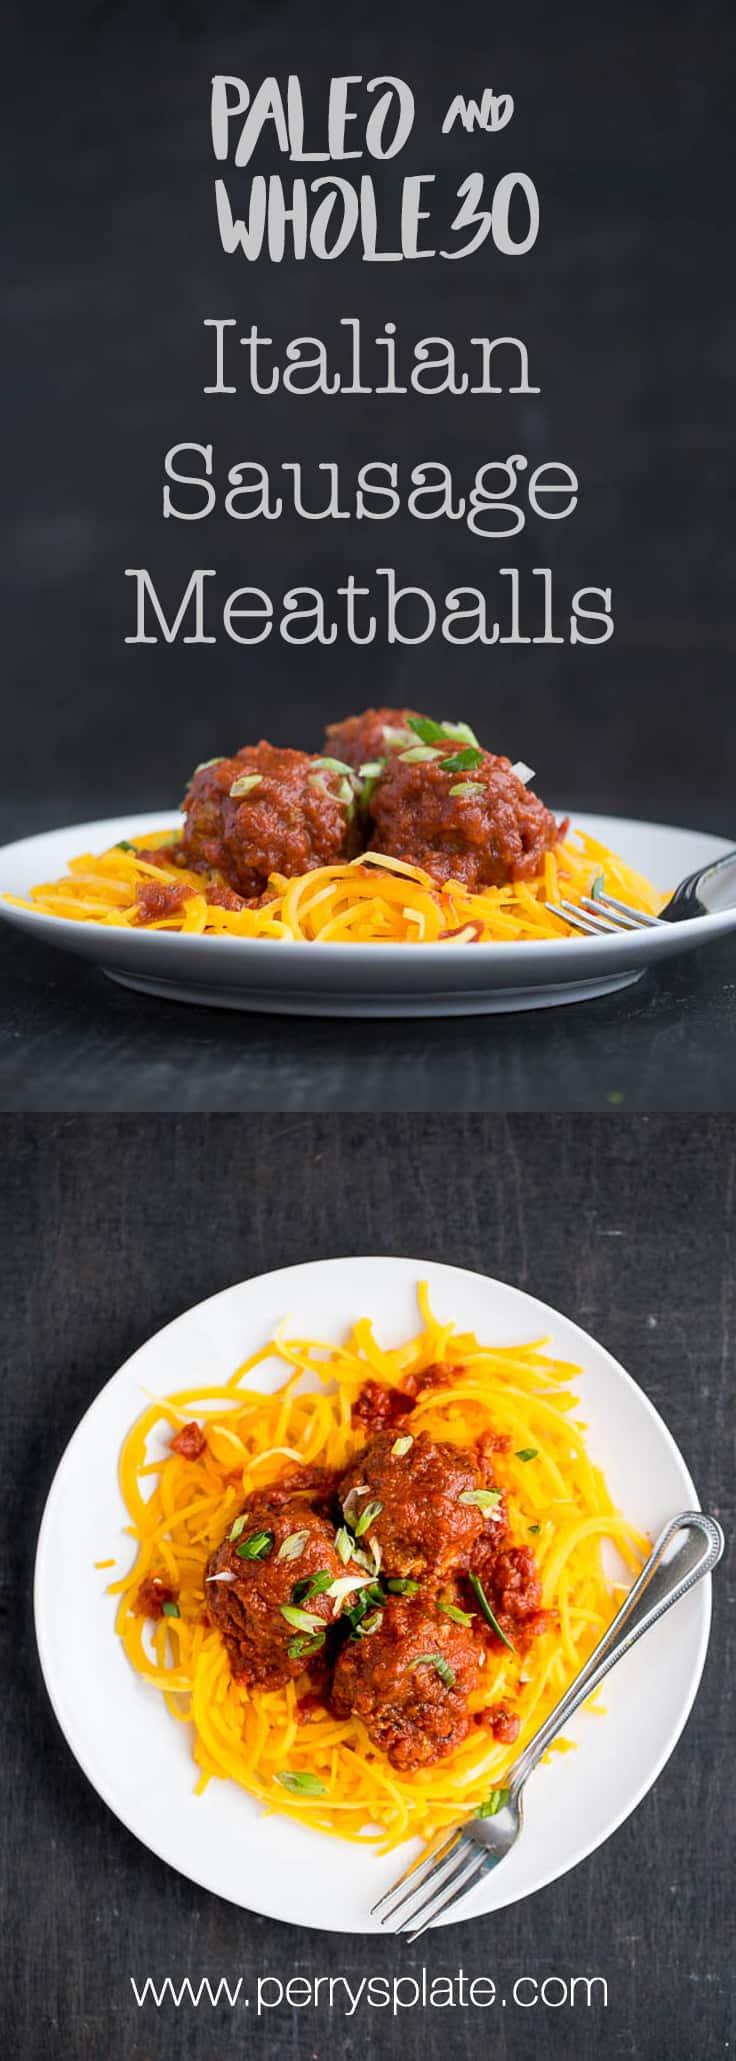 Easy Italian Sausage Meatballs | Whole30 recipes | paleo recipes | meatball recipes | healthy recipes | perrysplate.com